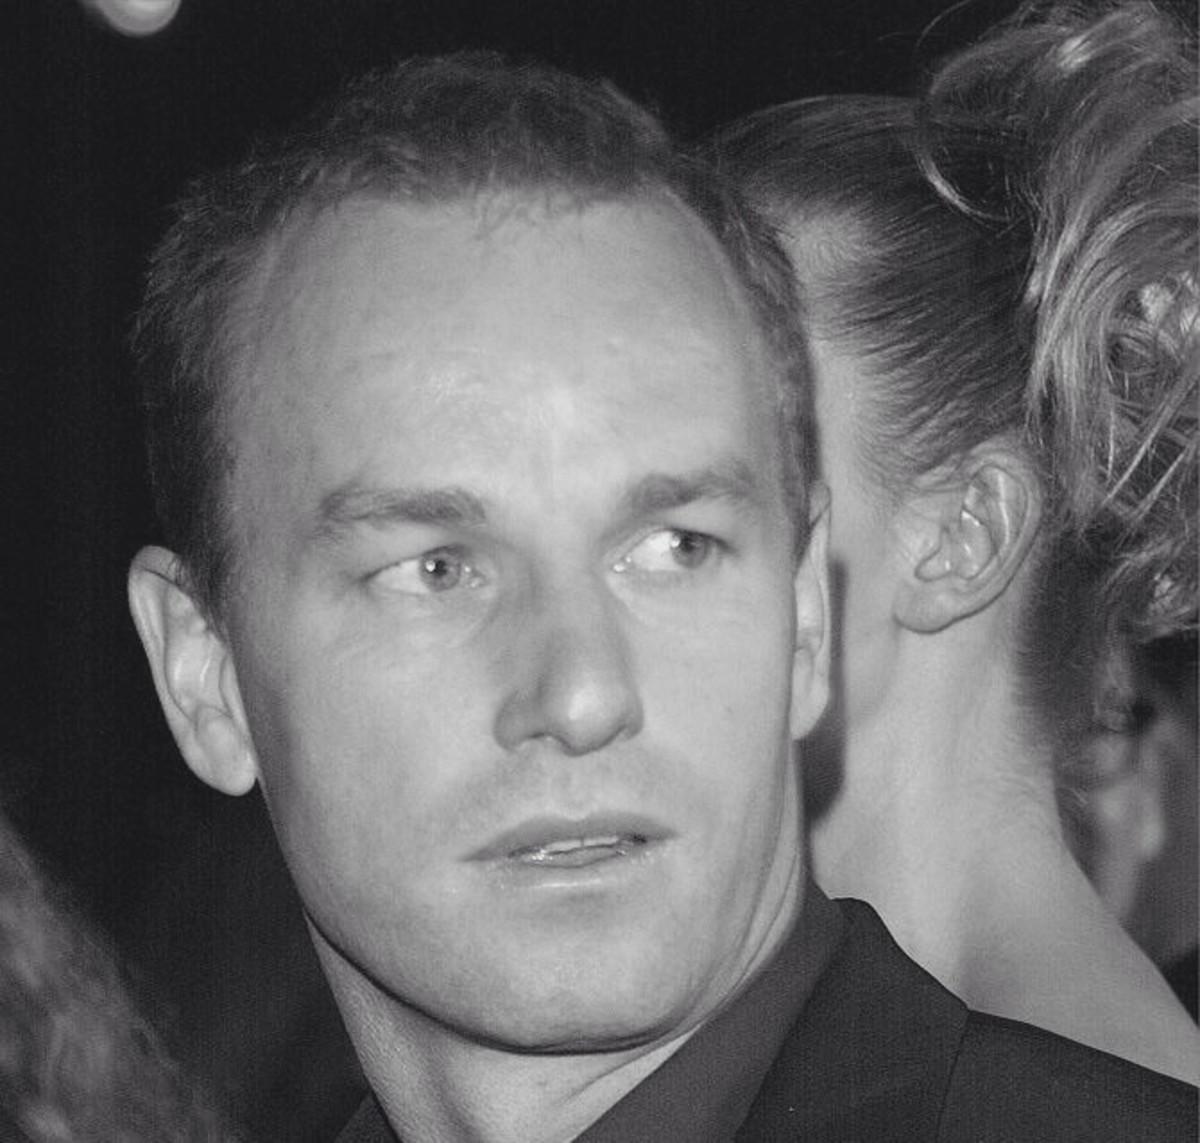 Director Antony Hoffman